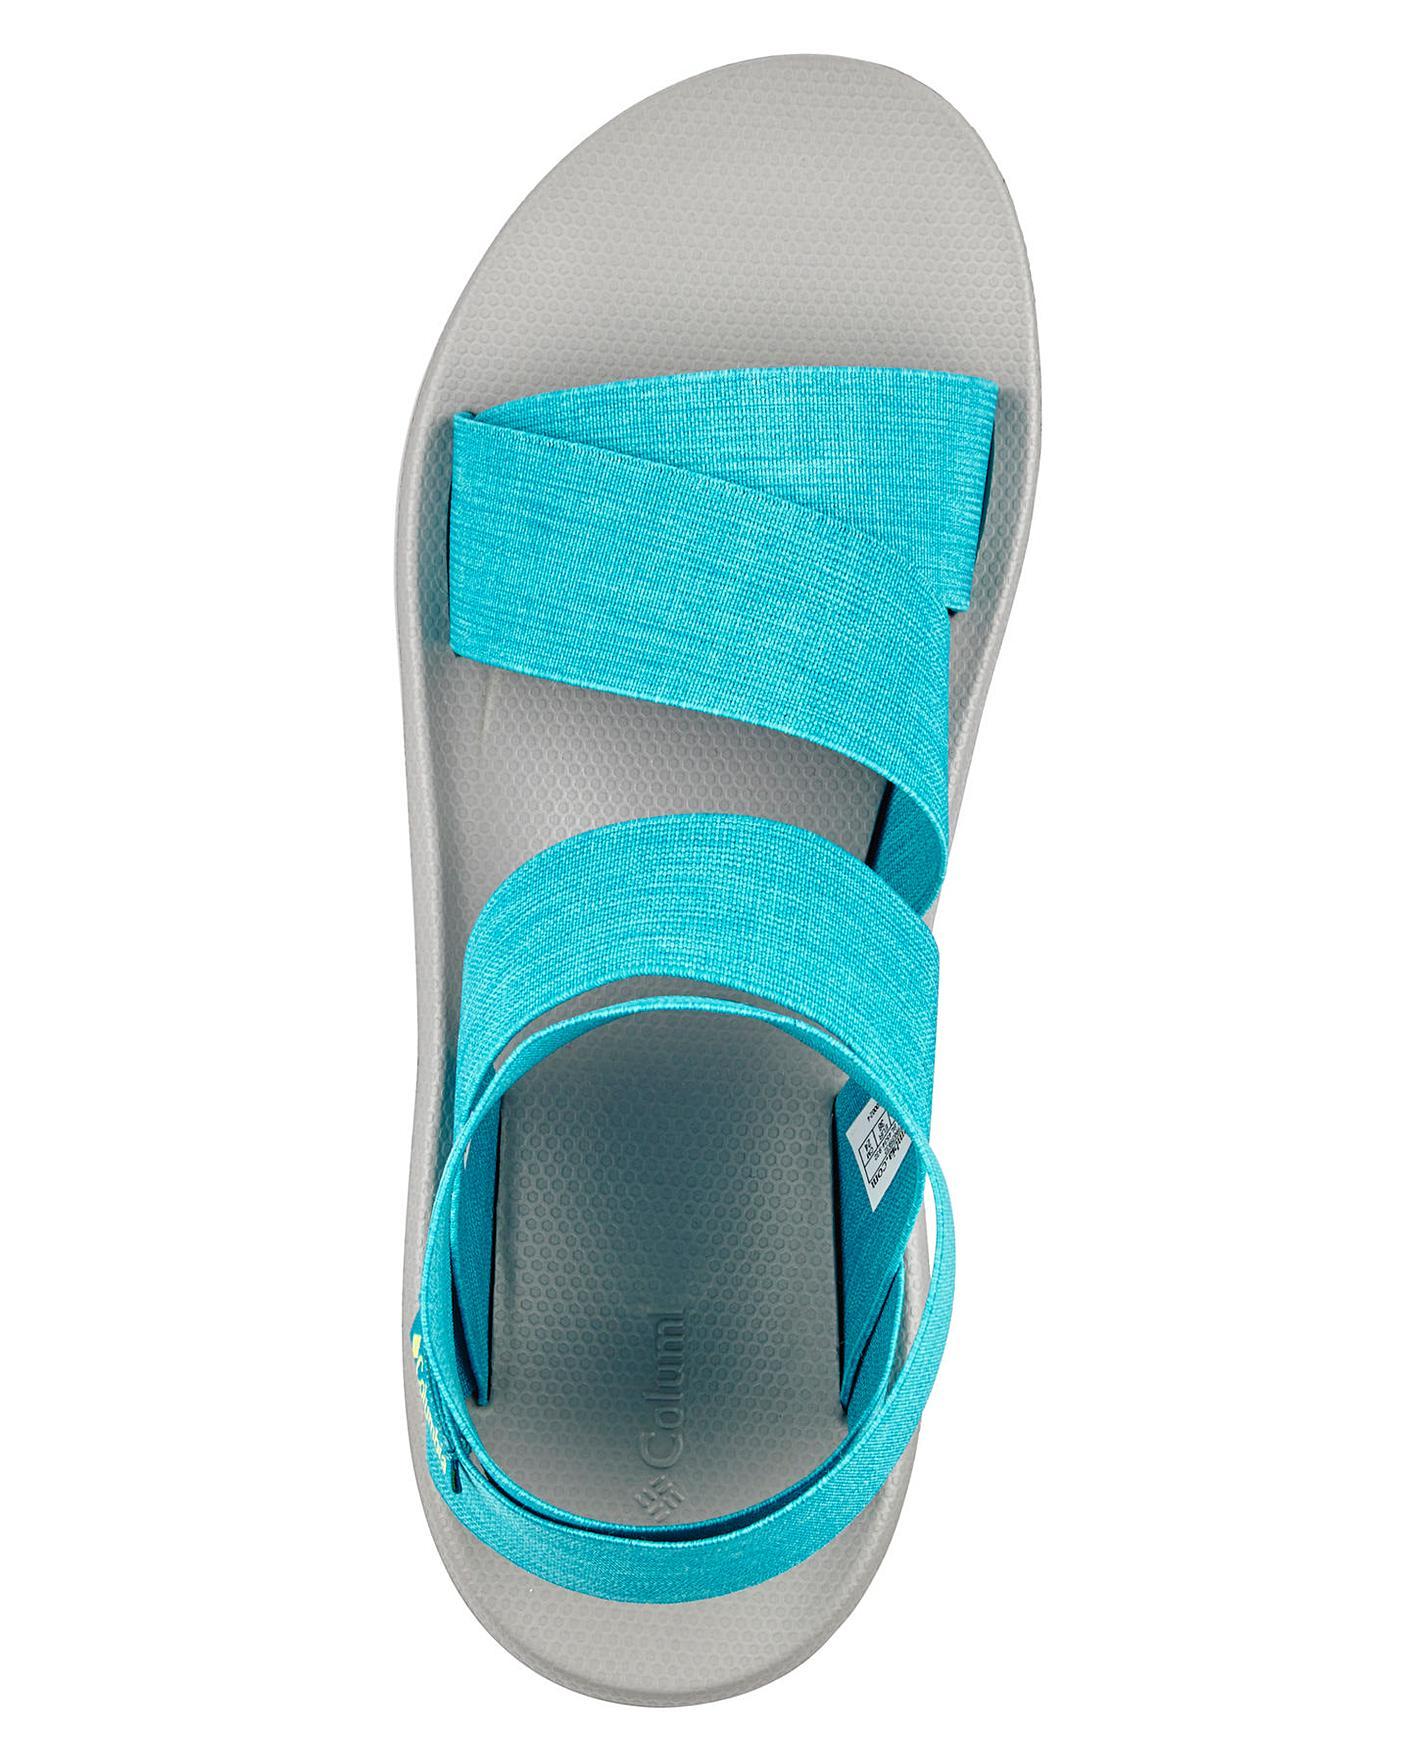 Columbia Barraca Strap Sandals Crazy Clearance